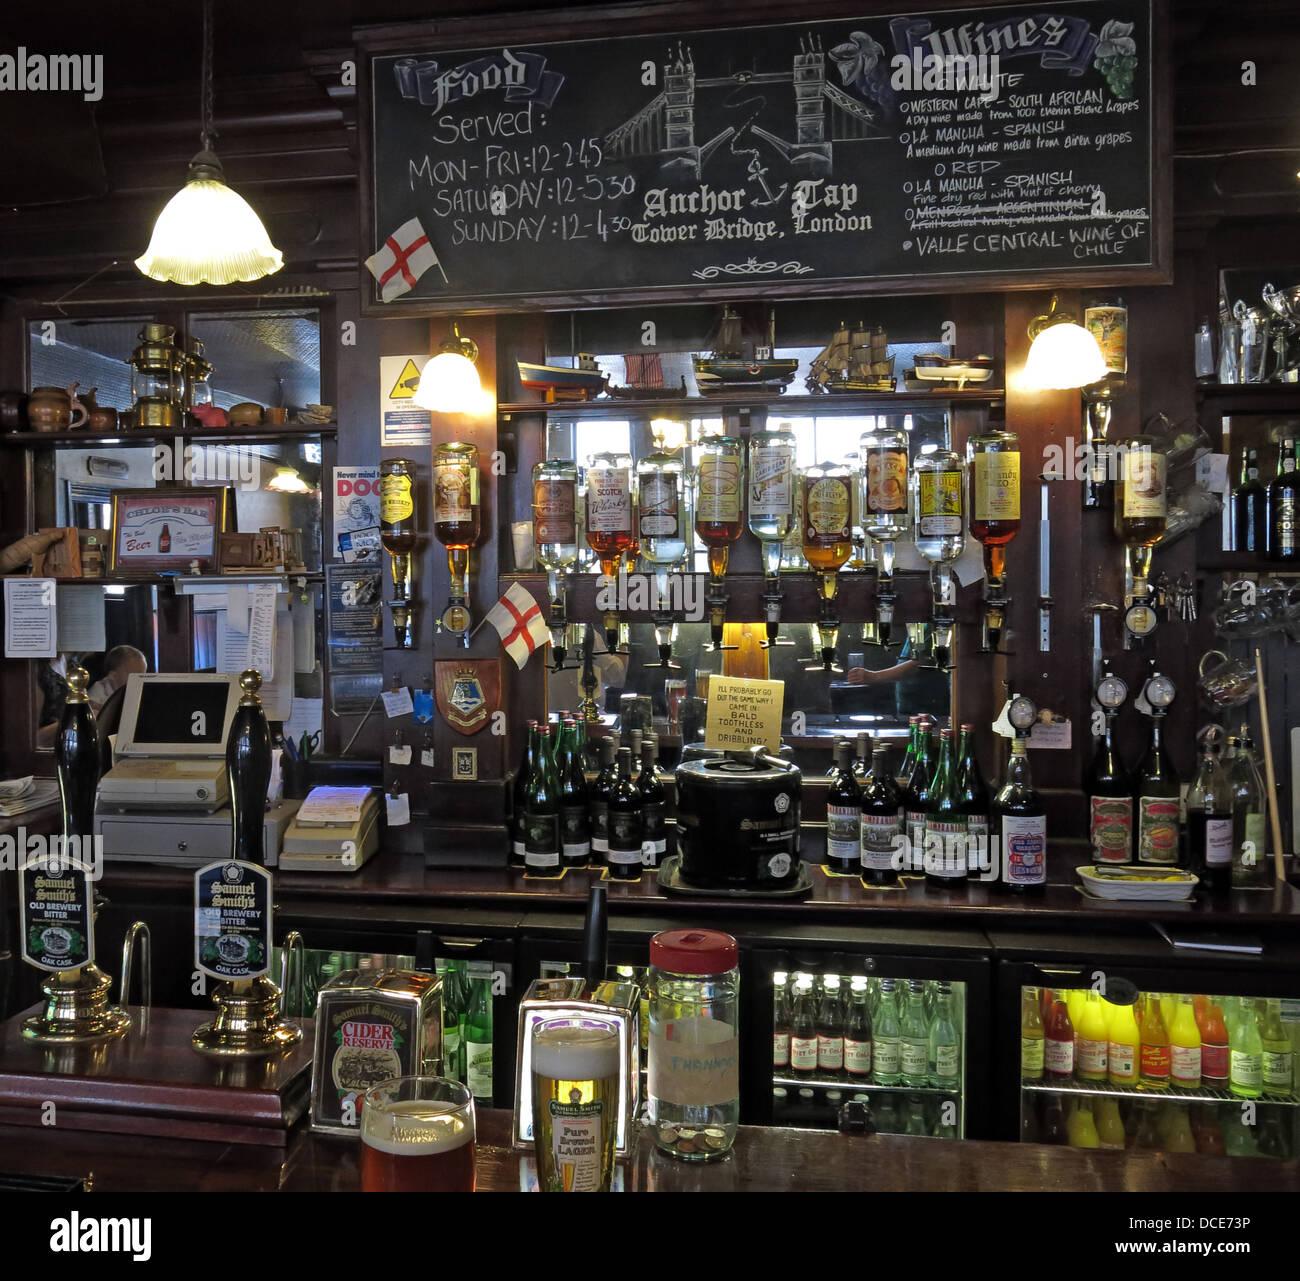 Bar area inside The Anchor Tap Samuel Smiths Pub Southwark London - Stock Image